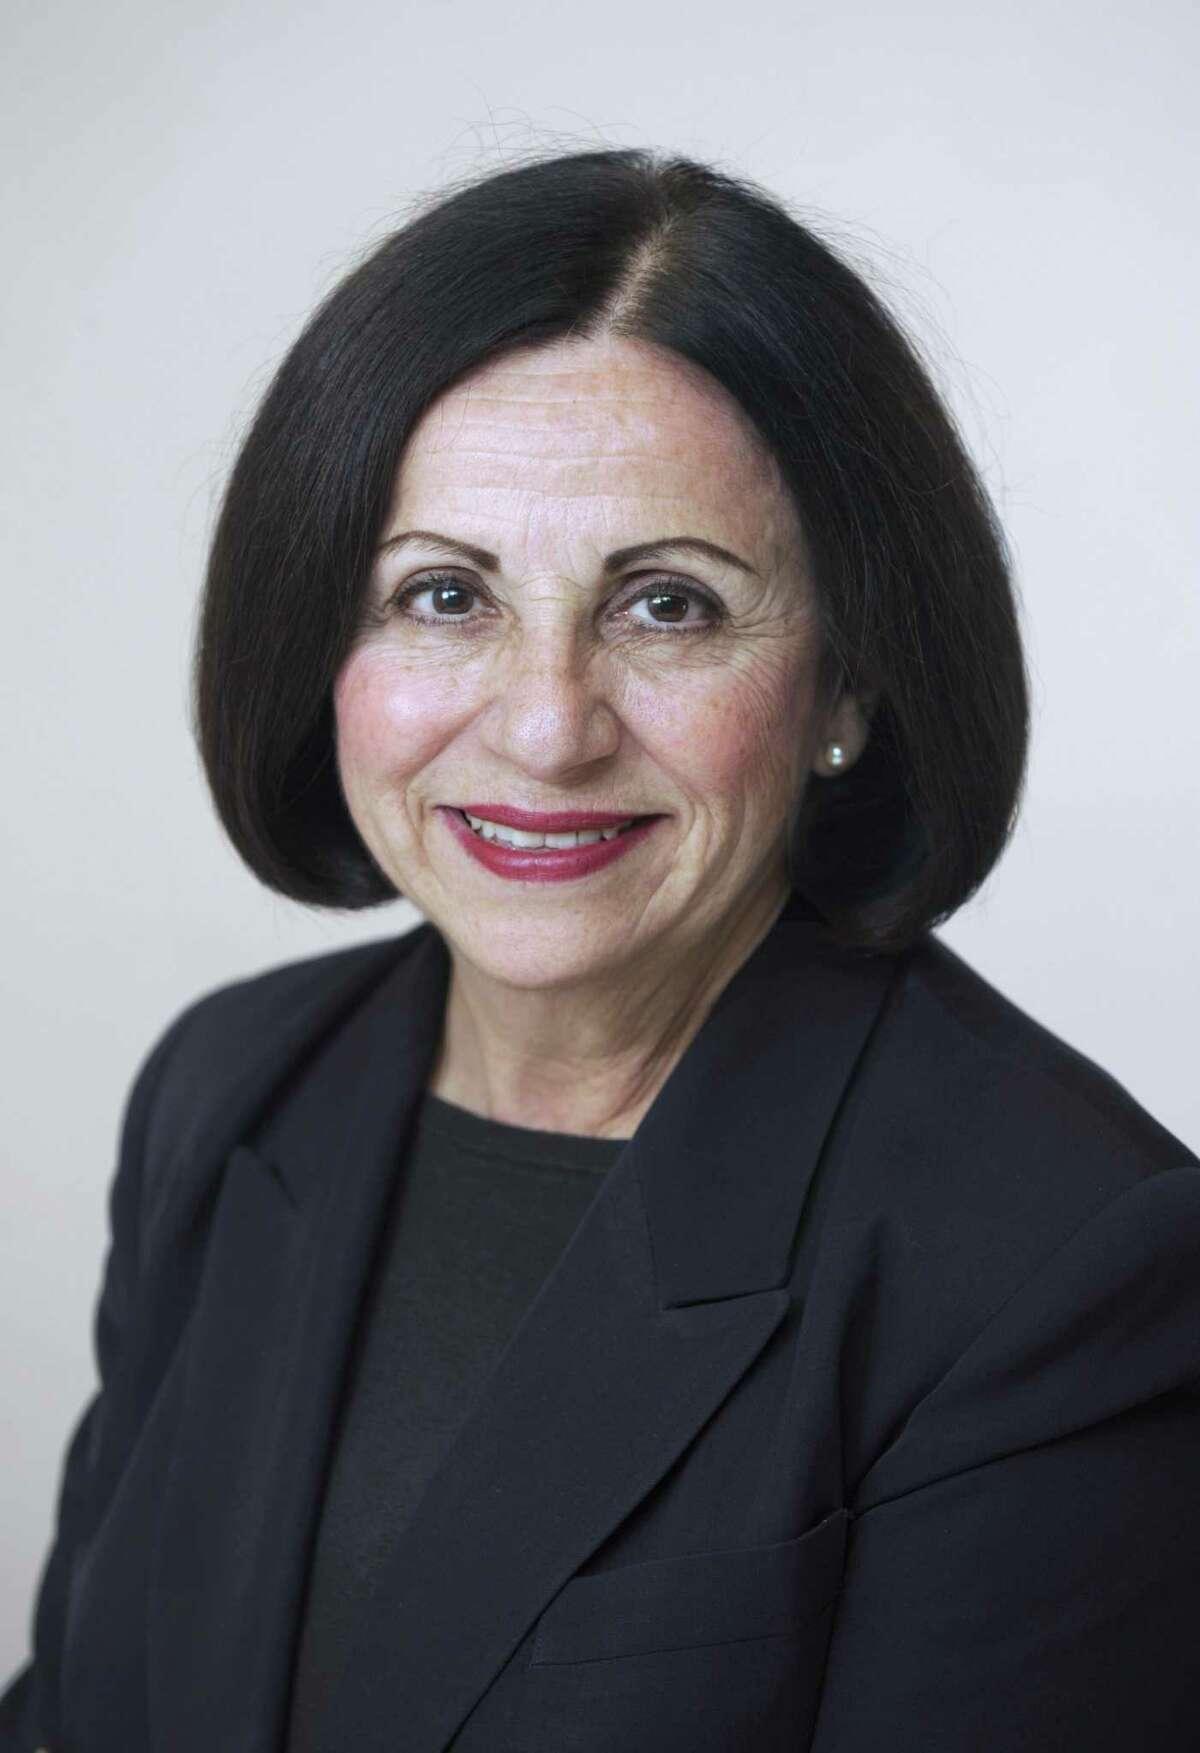 State Sen. Toni Boucher, 26th District. News-Times photo Thursday, Oct. 20, 2016.